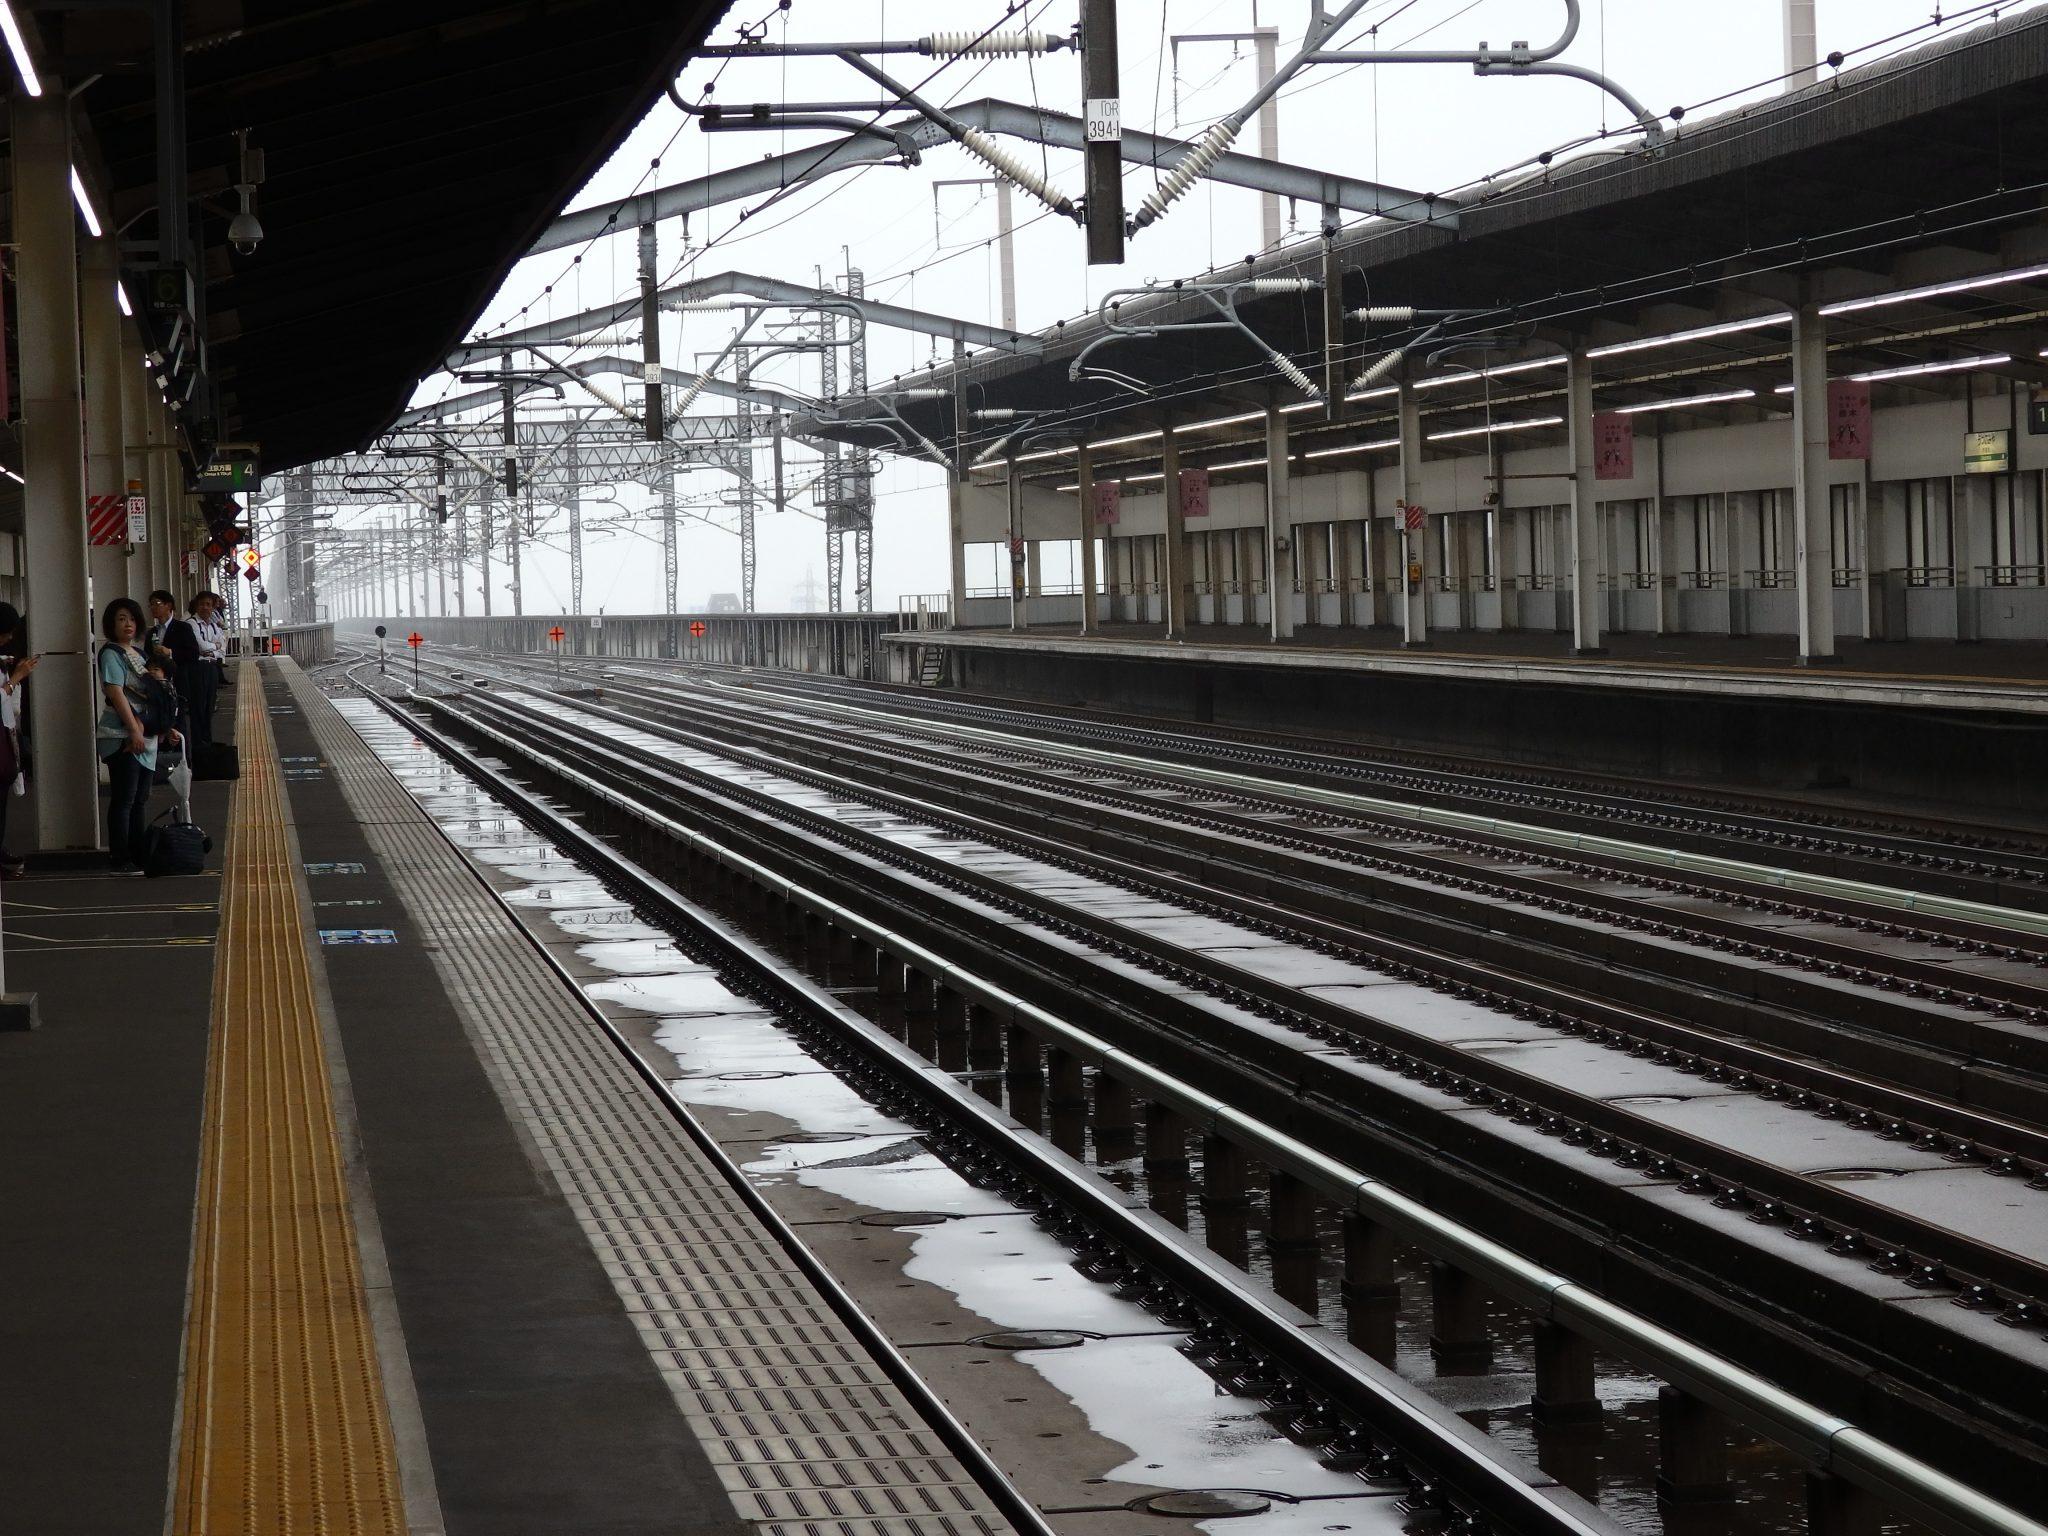 view of Japan Rail train tracks: what's your destination?